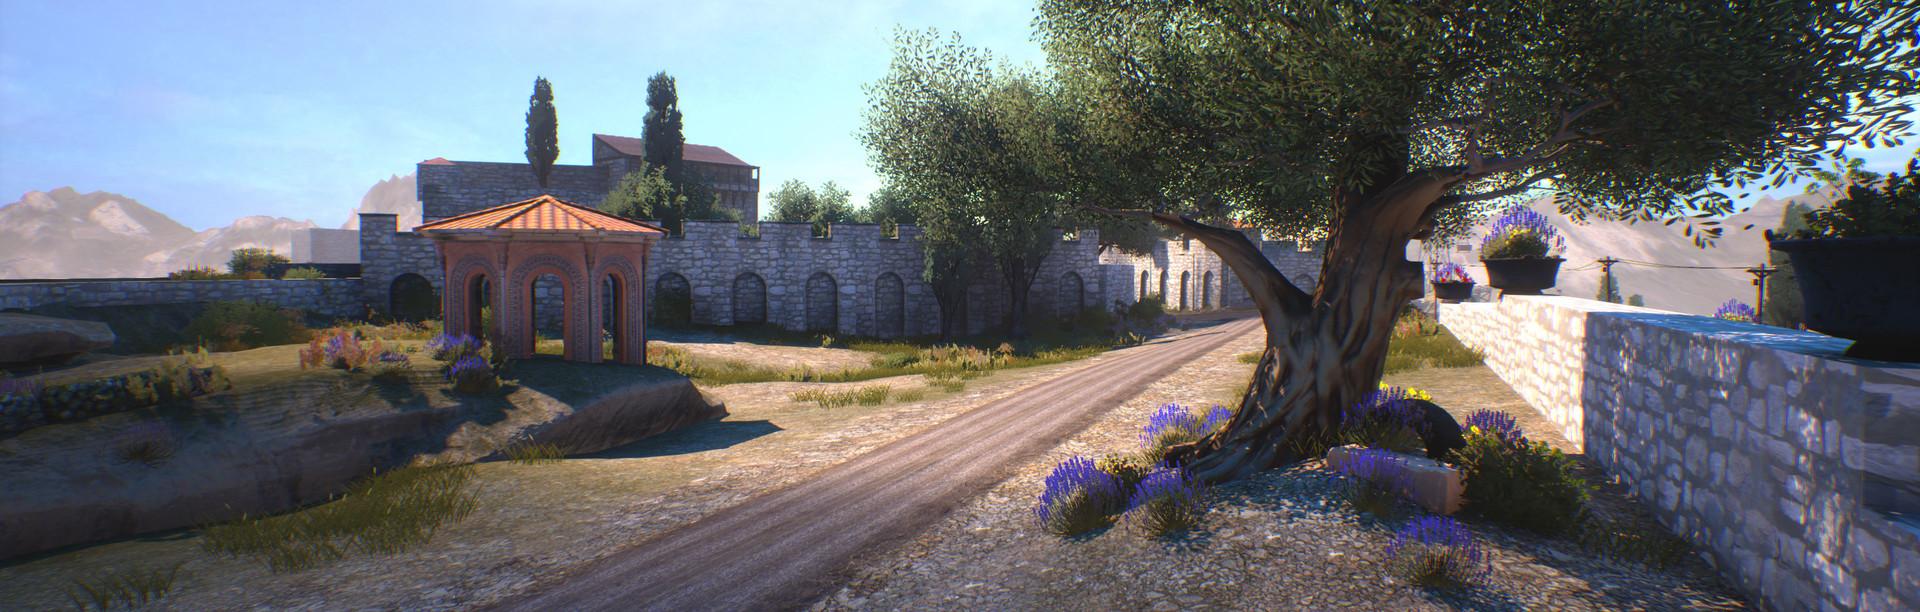 Florian thomasset european valley 16